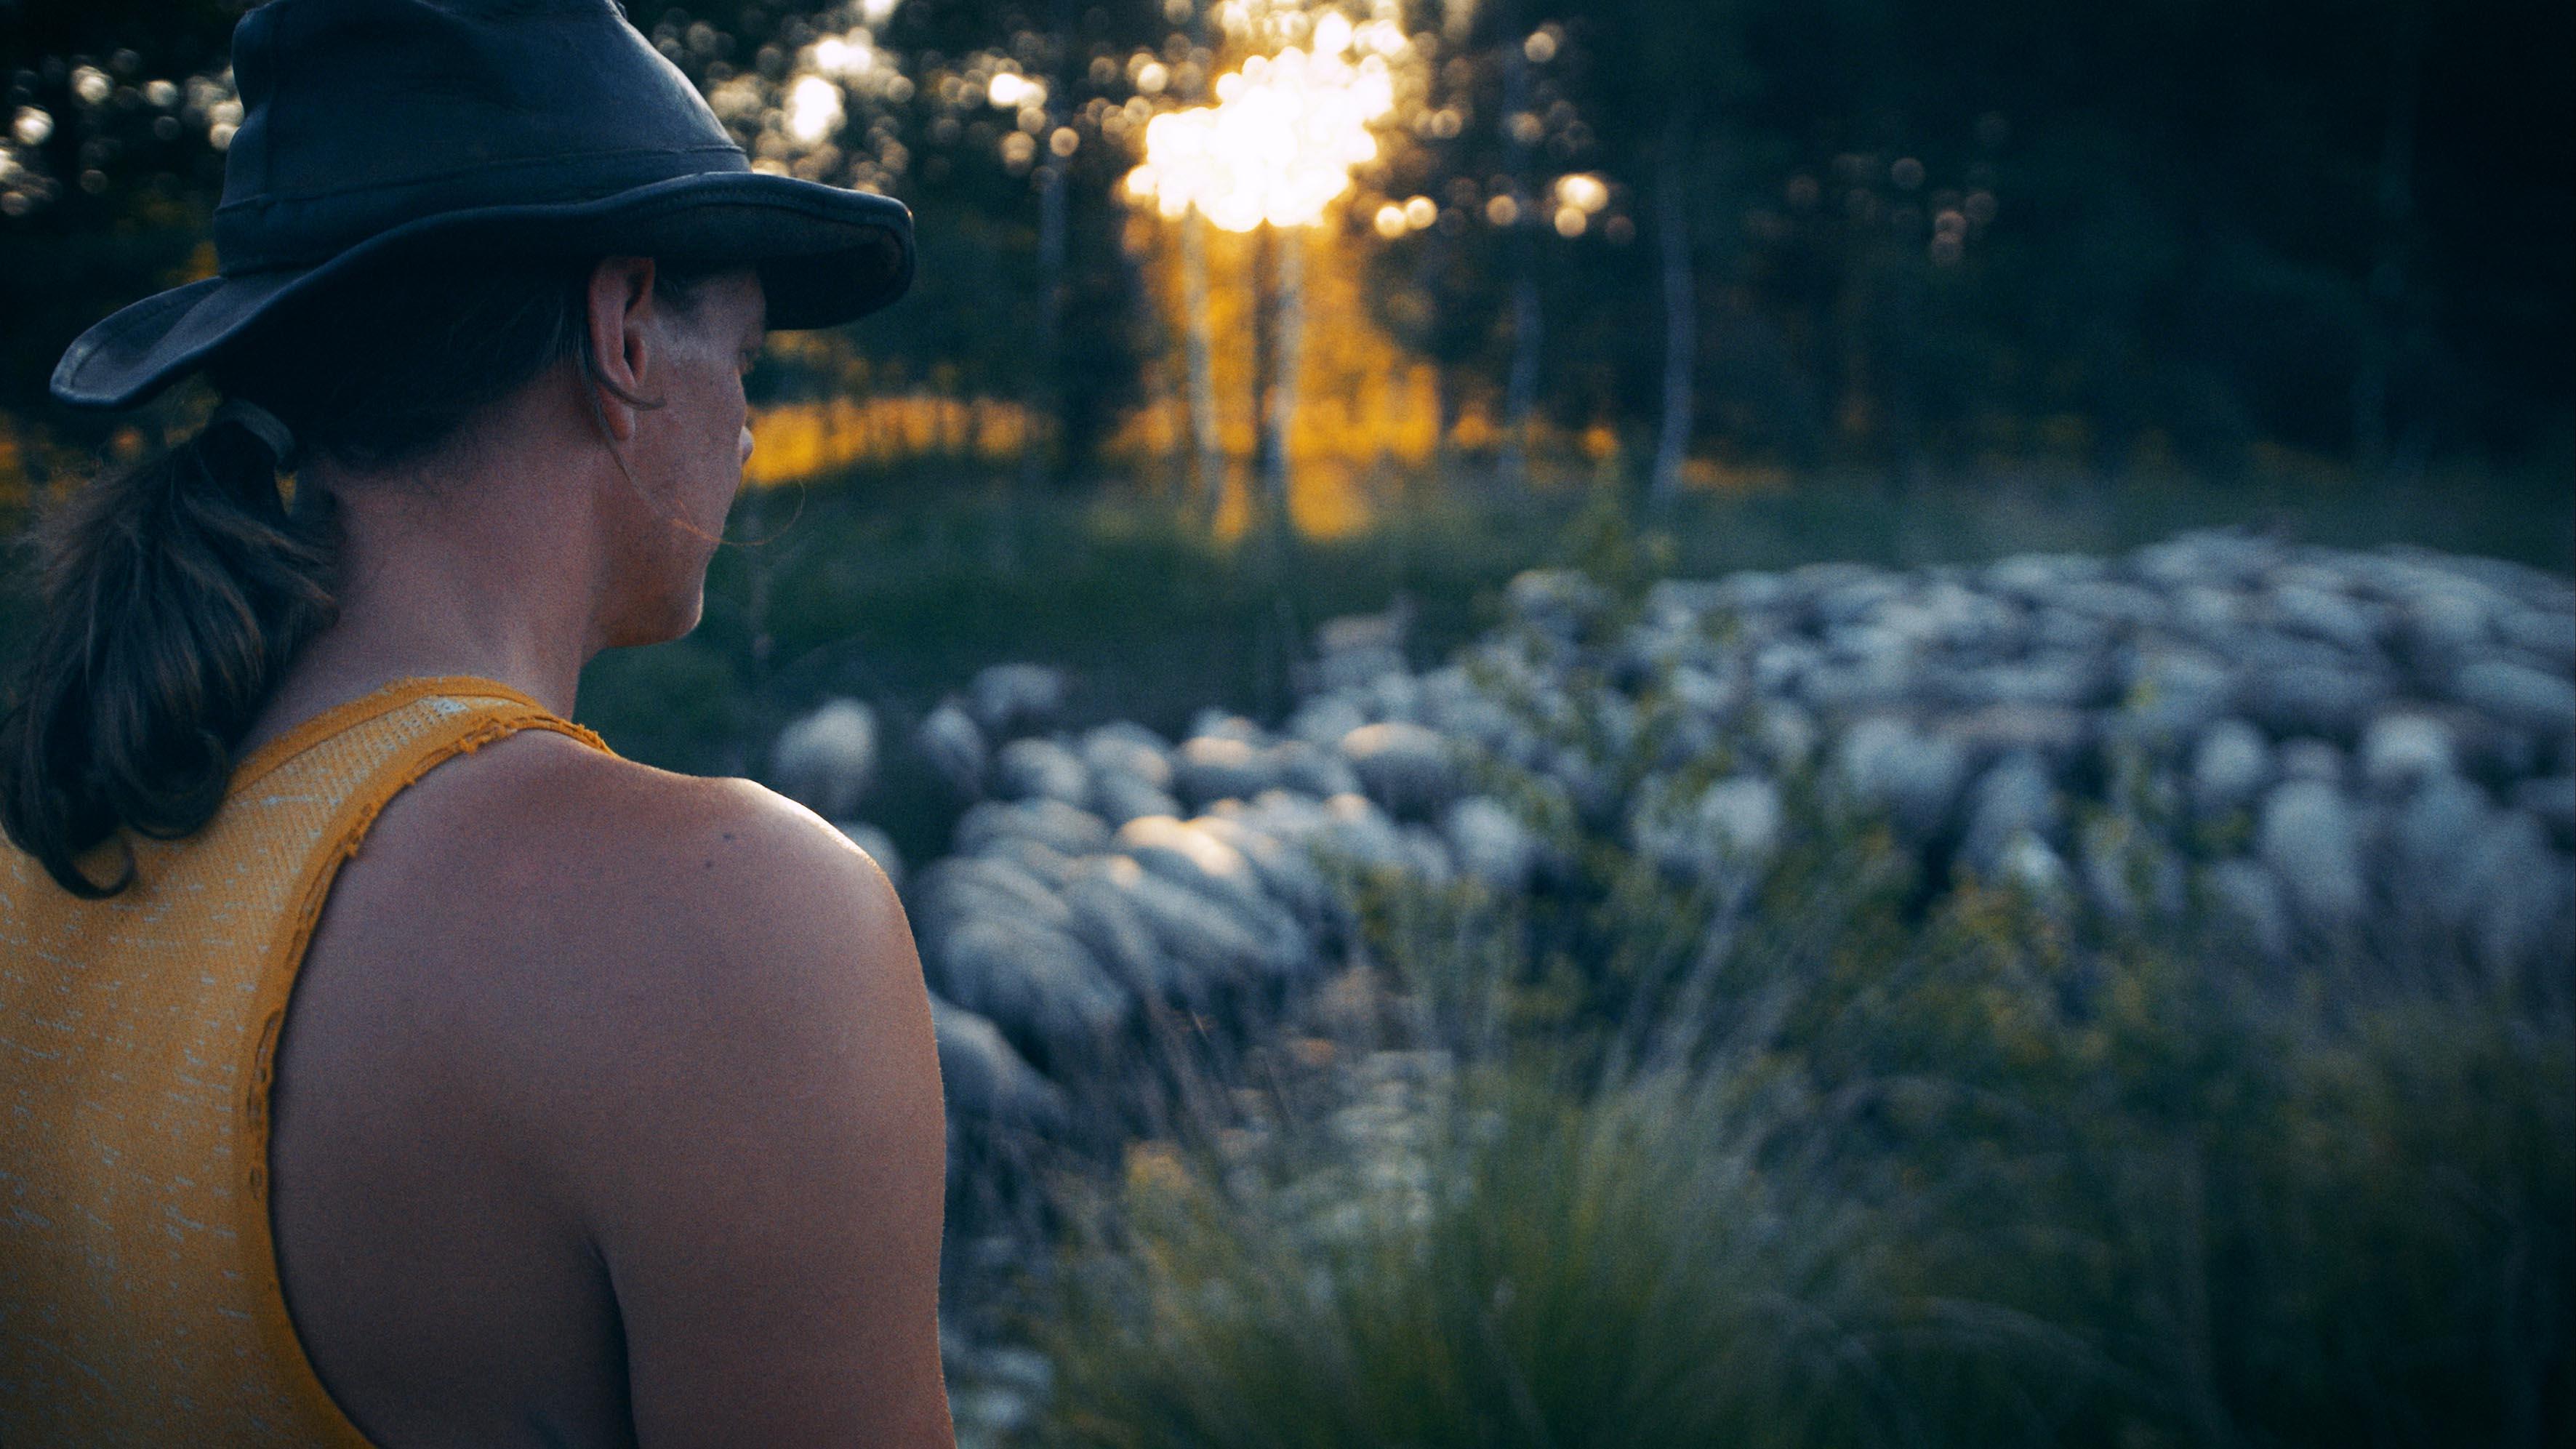 SHEEP HERO | Shepherd